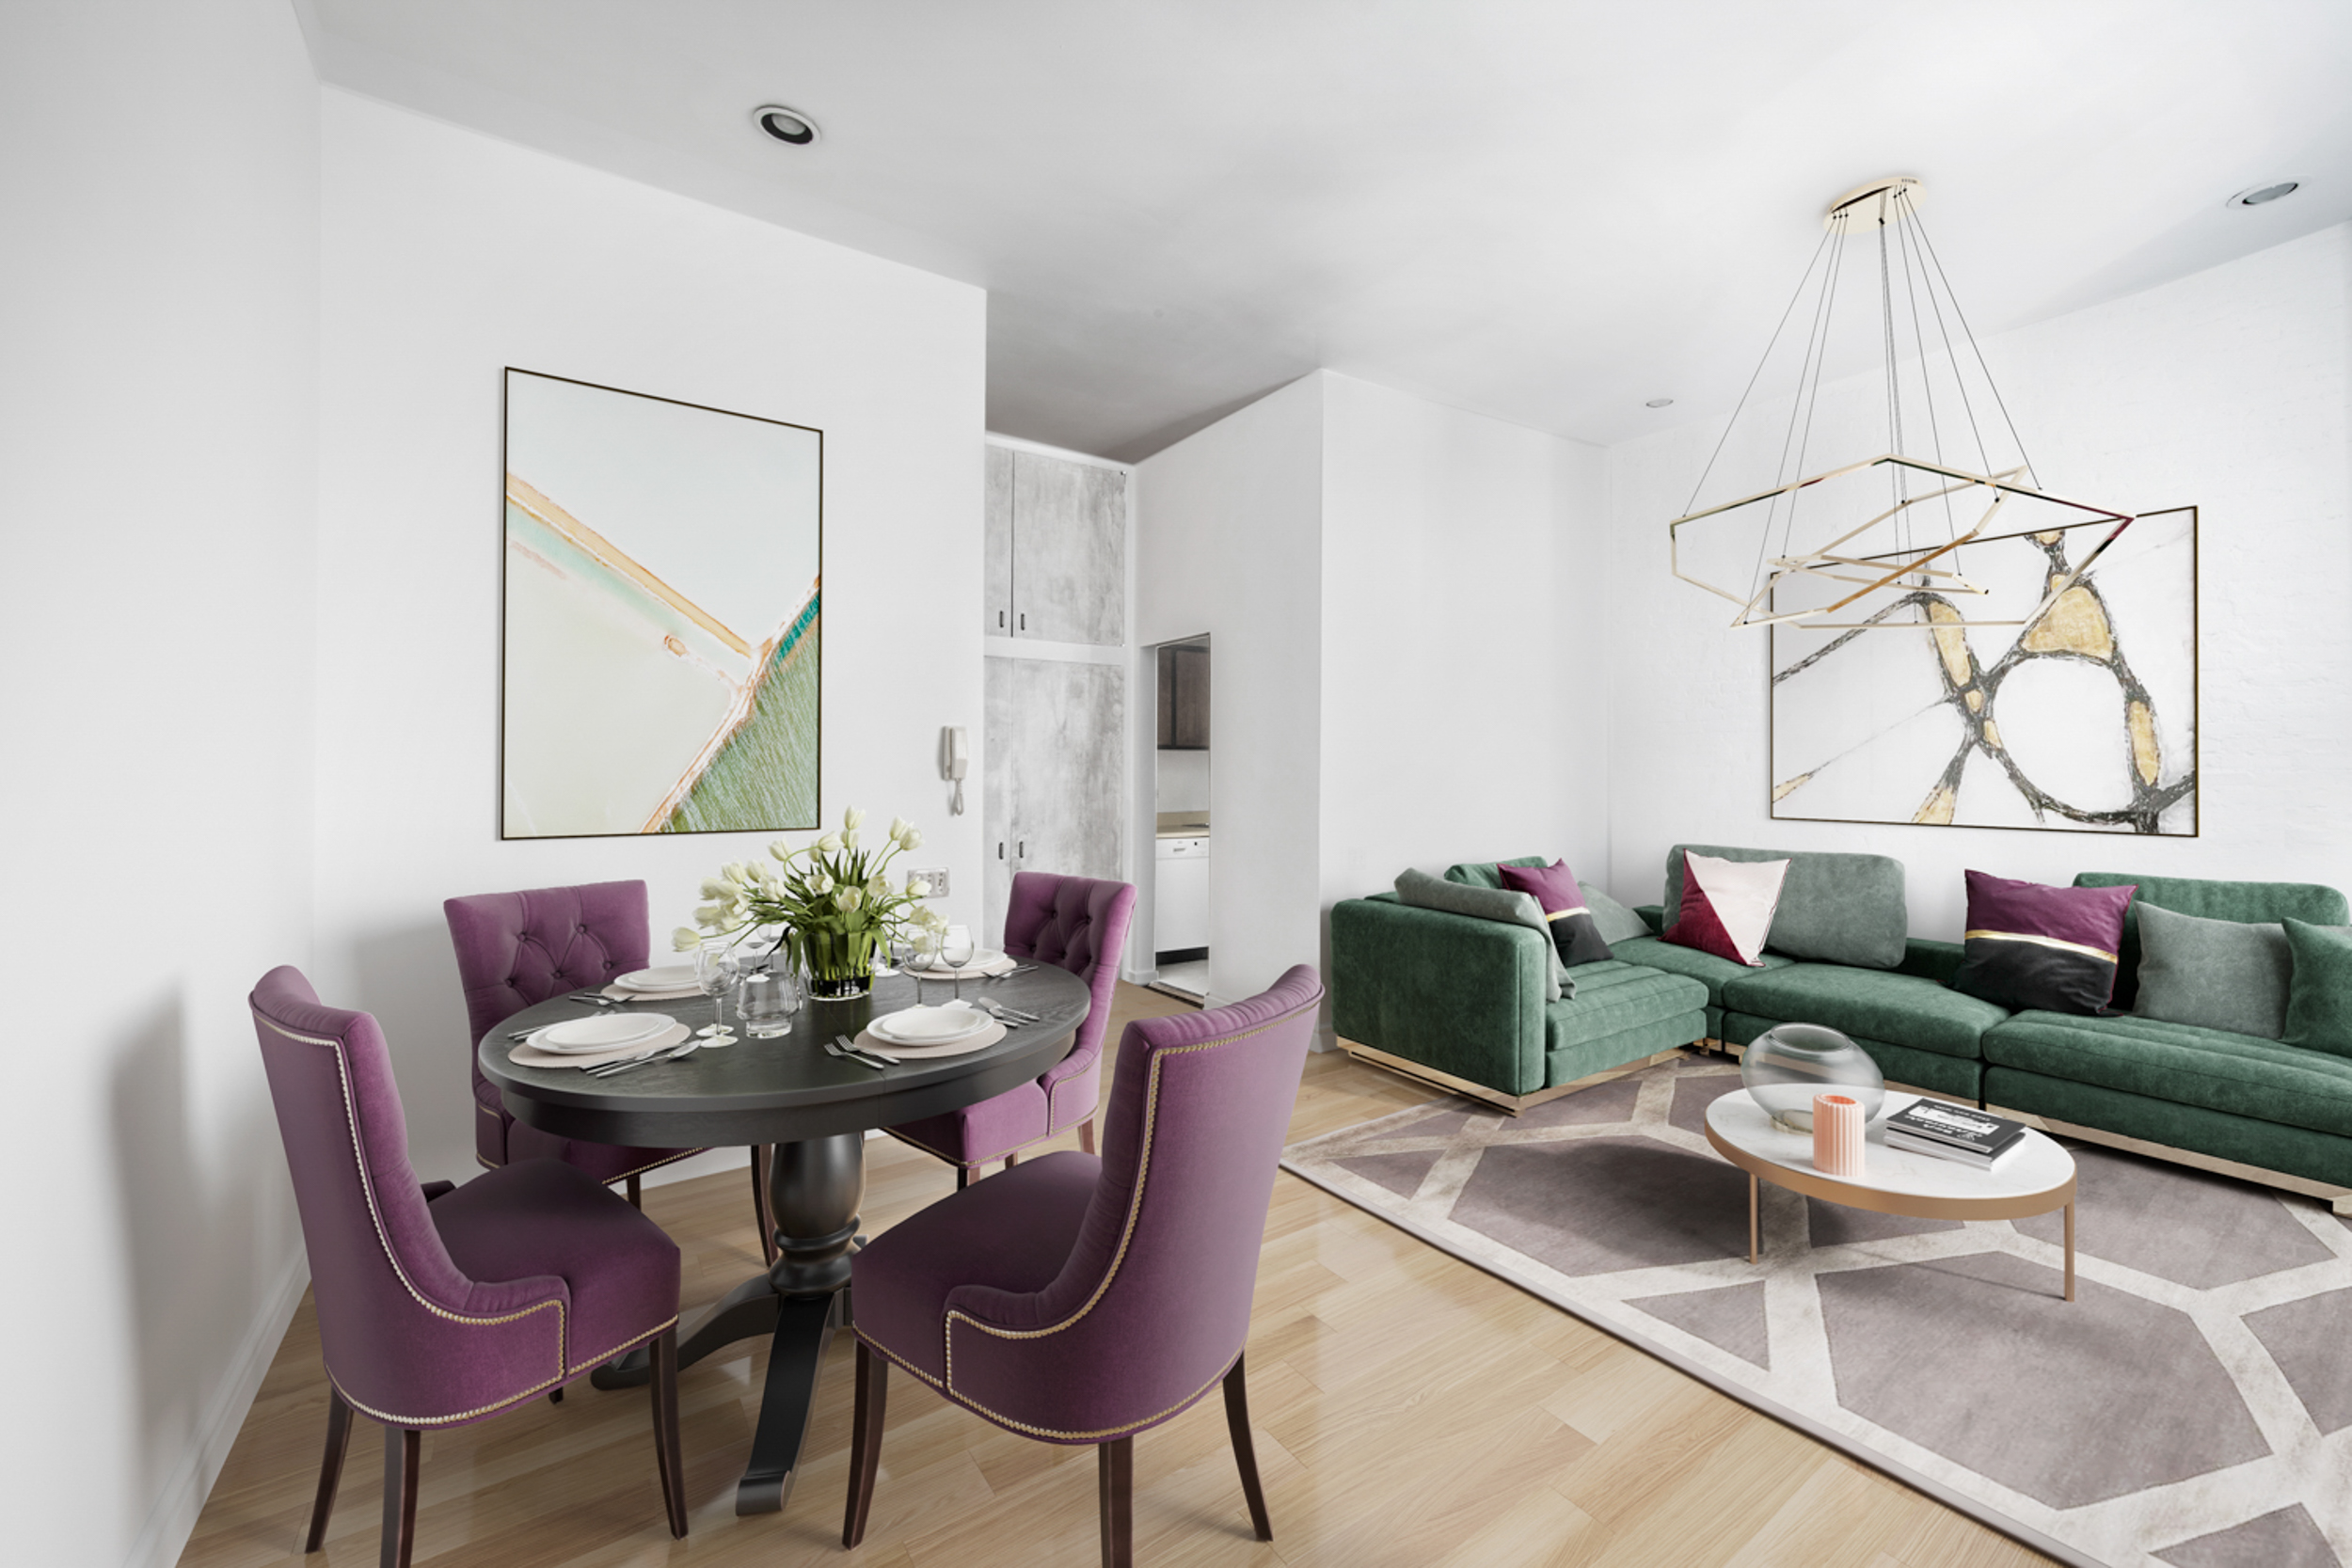 Living Room Angle 2_Staged.jpg